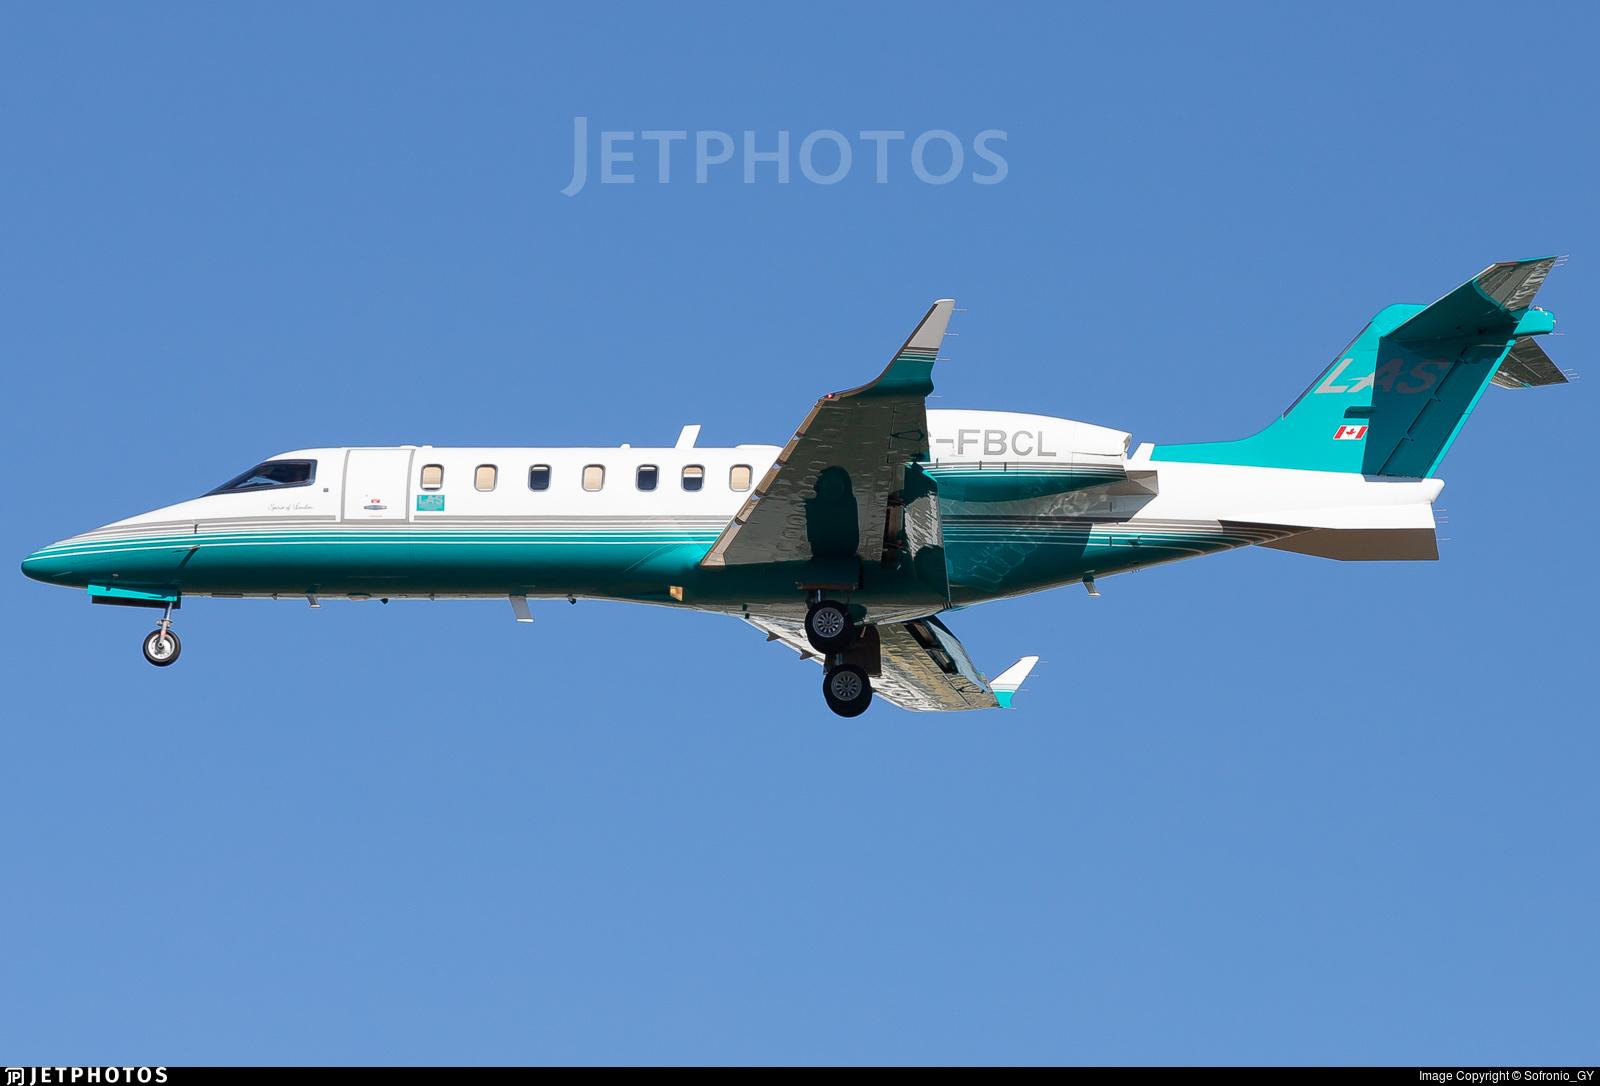 C-FBCL - Bombardier Learjet 45 - London Air Services